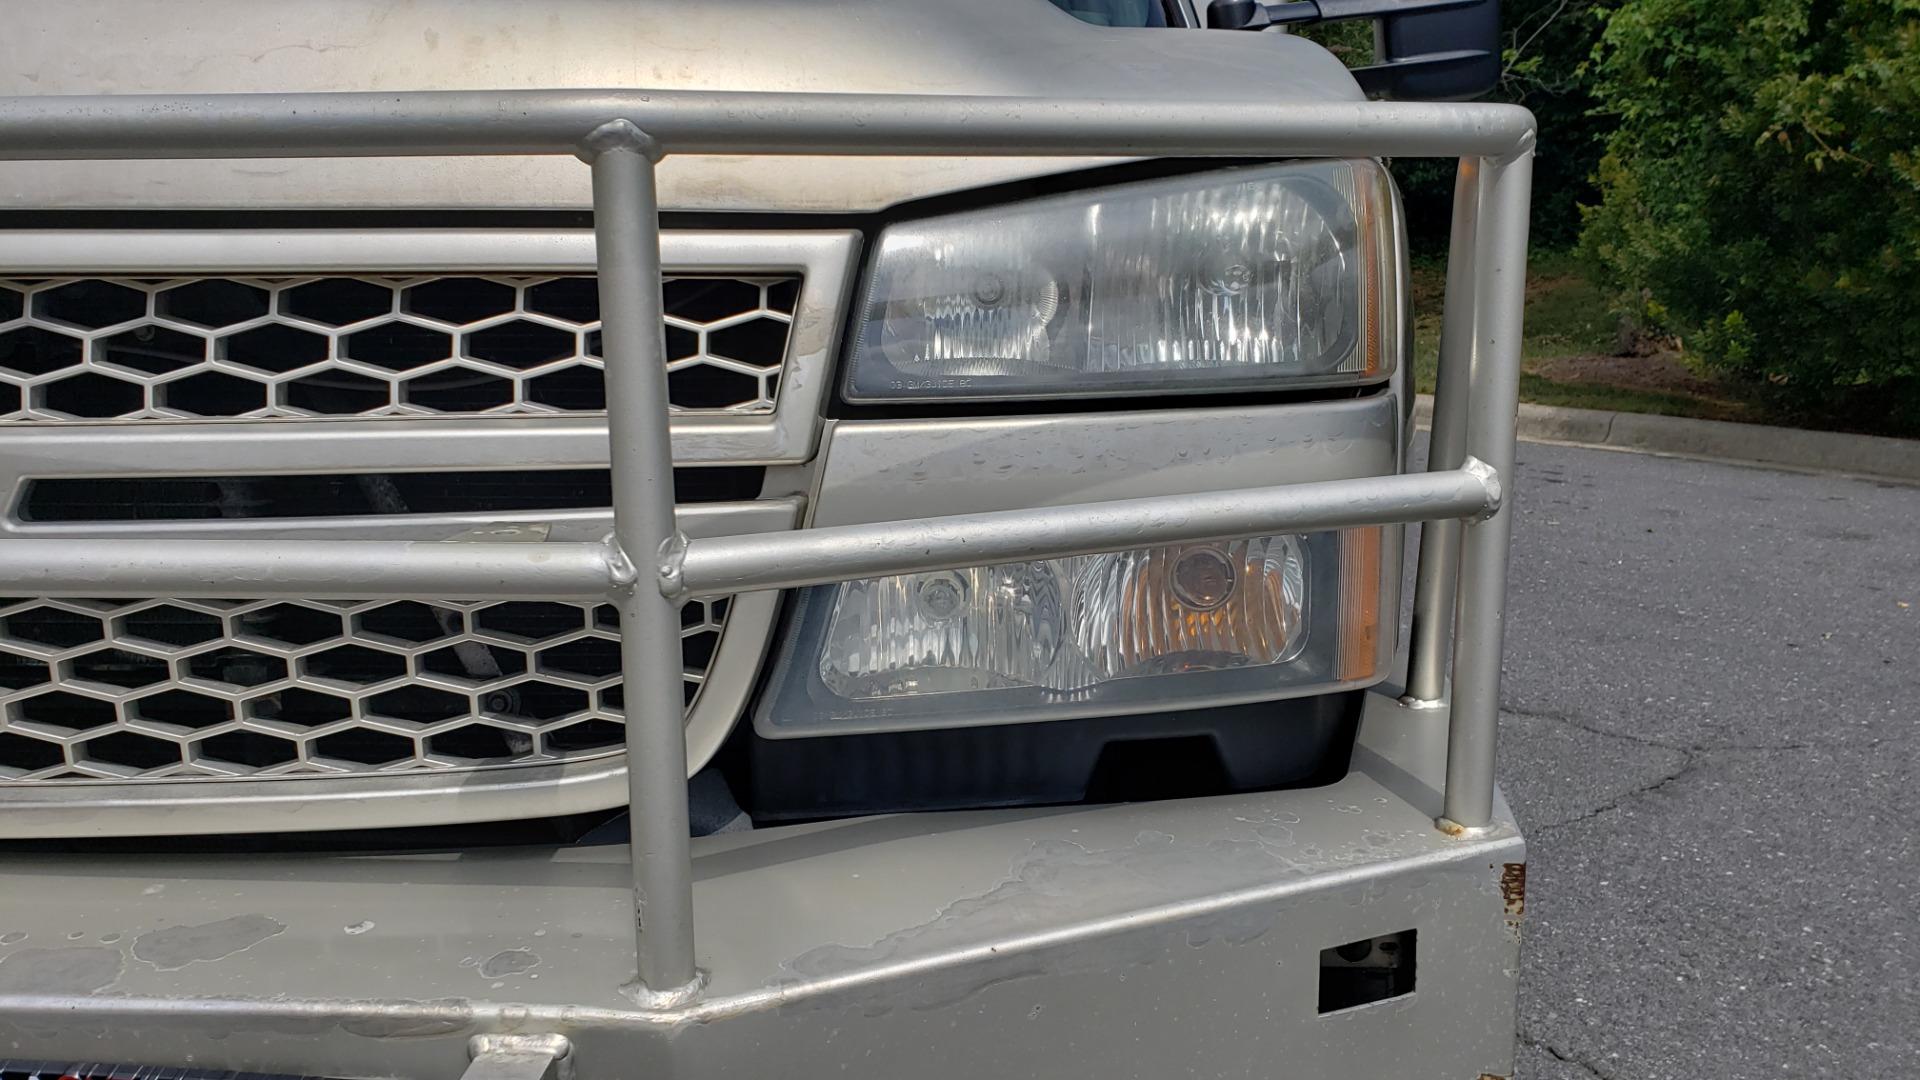 Used 2005 Chevrolet SILVERADO 3500 DRW / 4WD / REG CAB / 6.6L DURAMAX / DOOMSDAY PREPPER for sale $21,595 at Formula Imports in Charlotte NC 28227 18